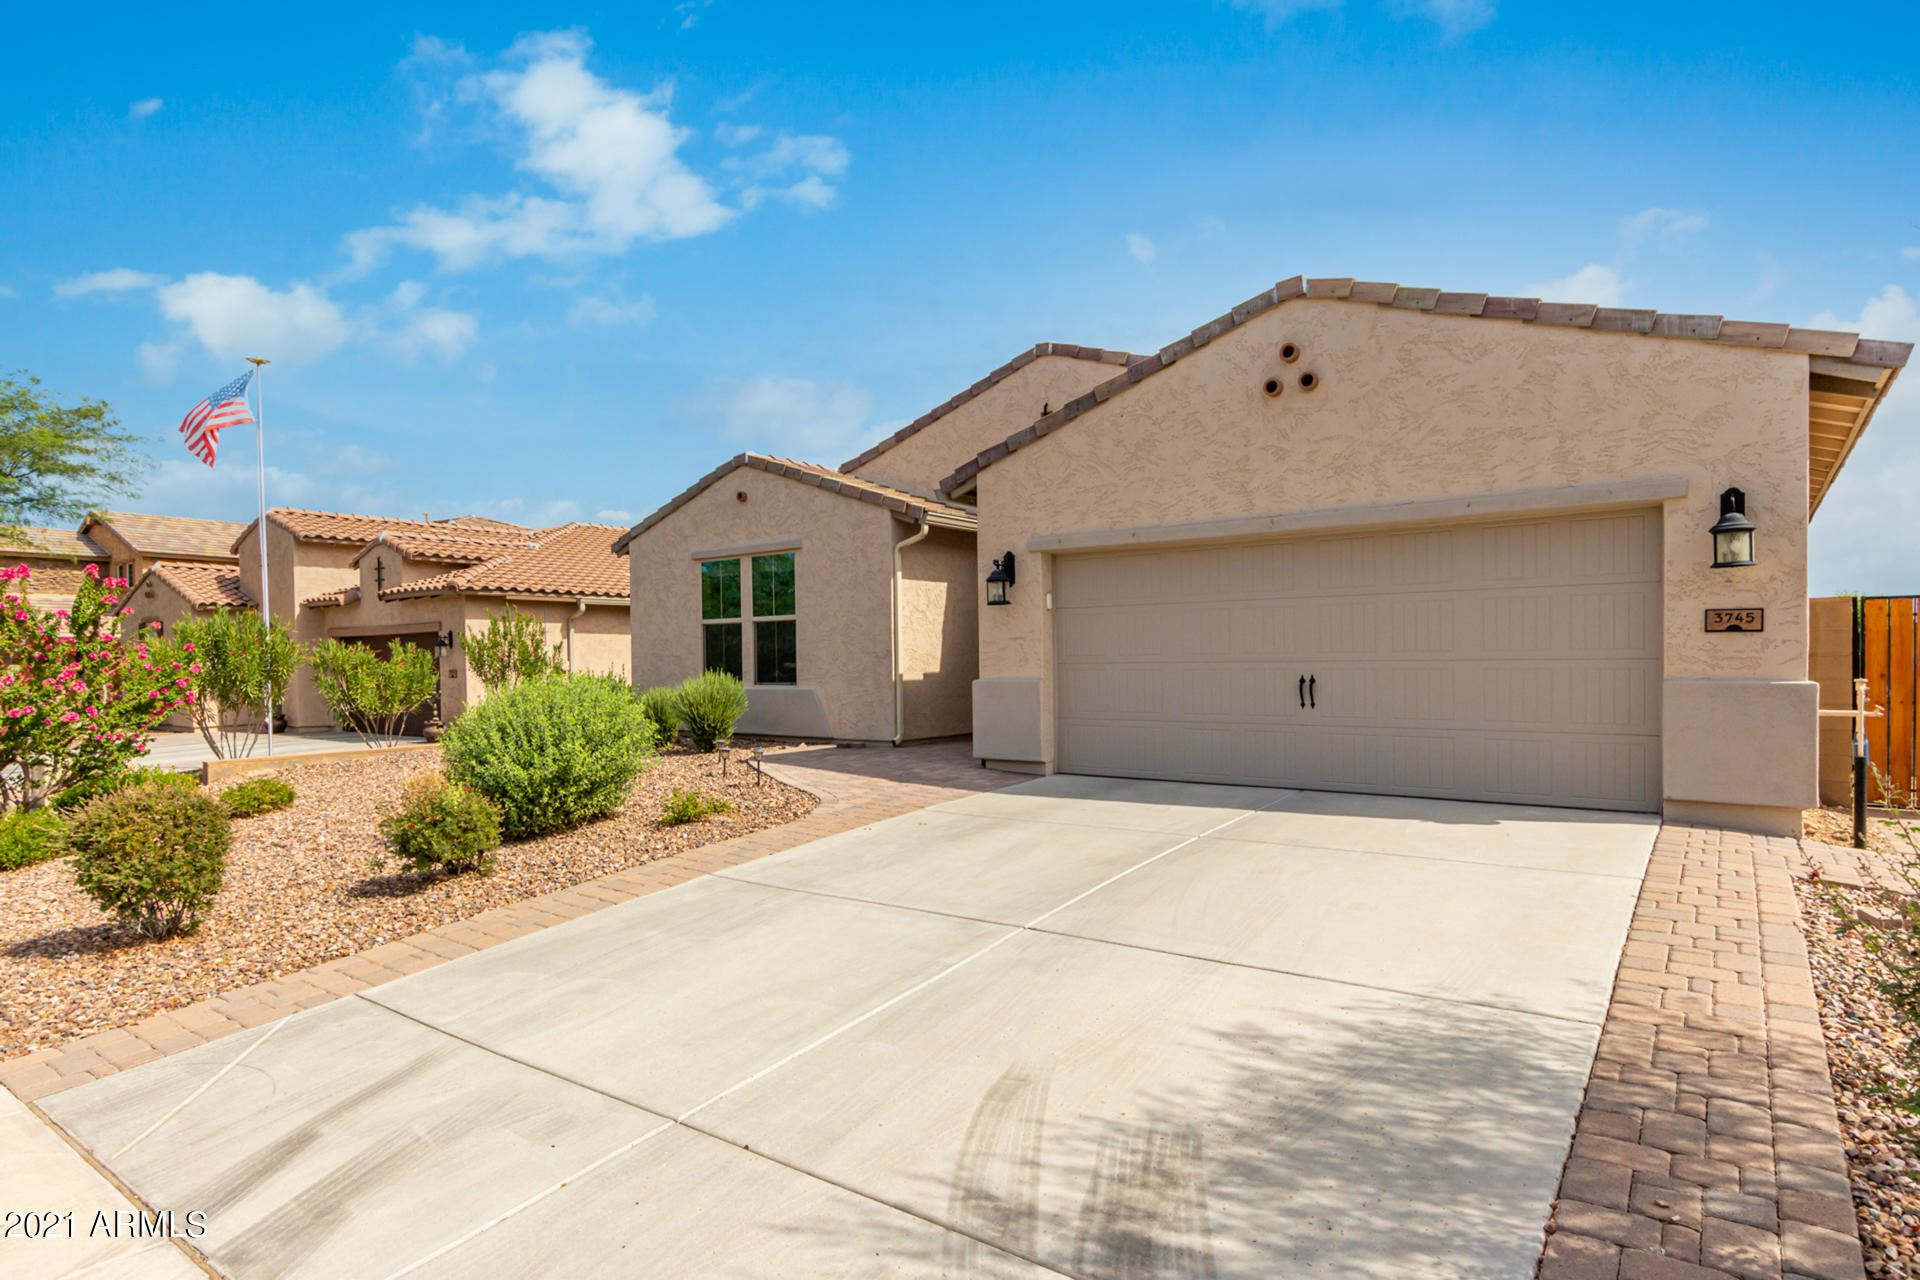 Photo of 3745 W BINGHAM Drive, New River, AZ 85087 (MLS # 6266919)